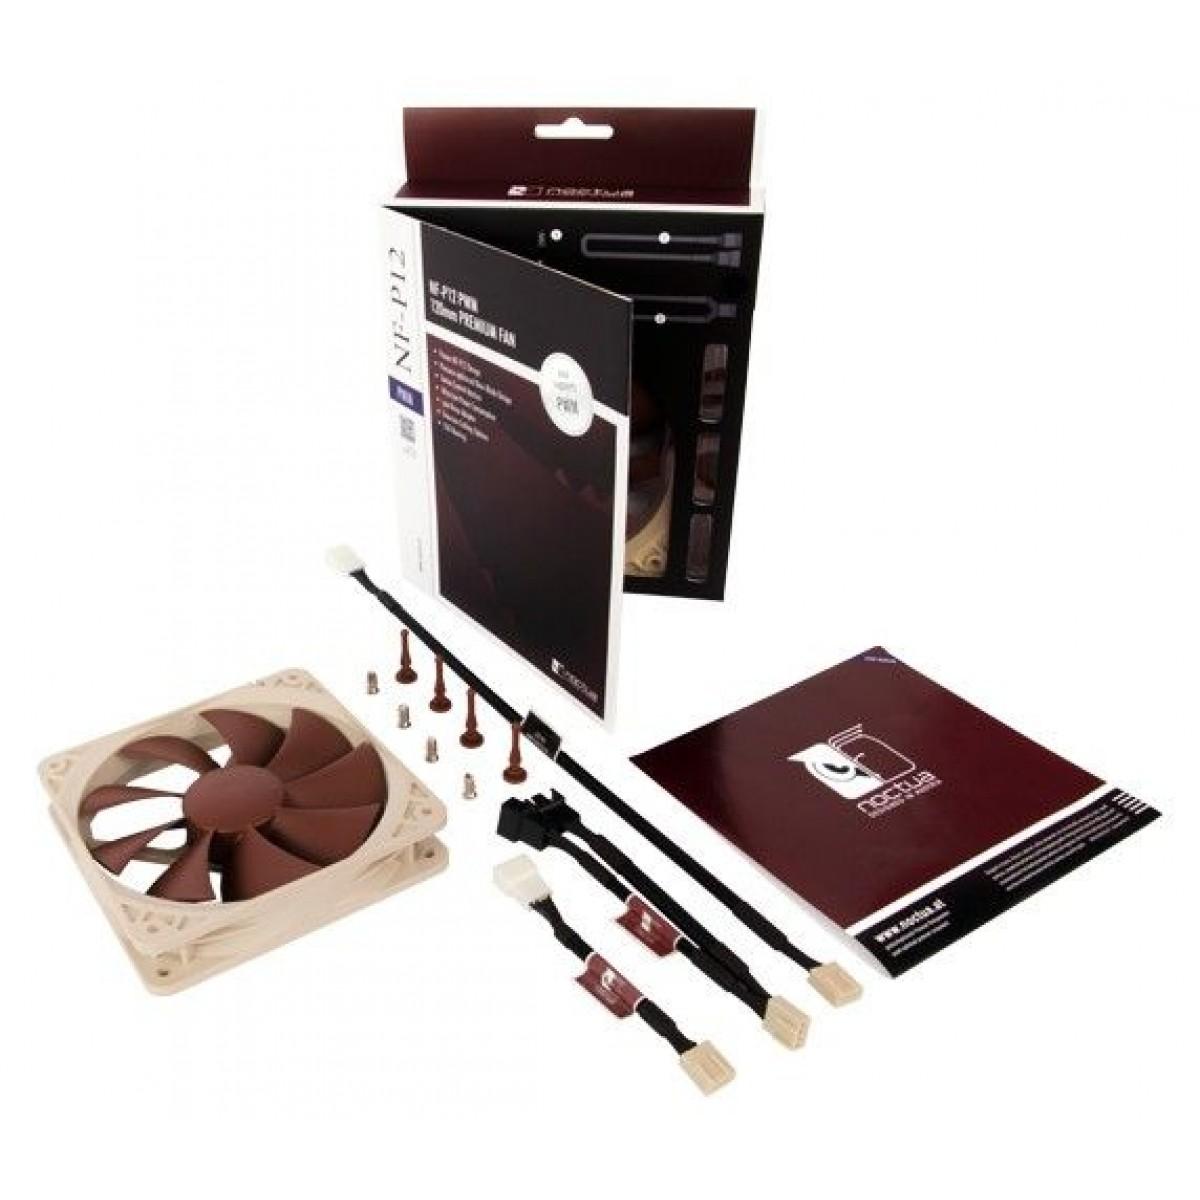 Cooler para Gabinete Noctua NF-P12 PWM, Beige, 120mm, NF-P12 PWM